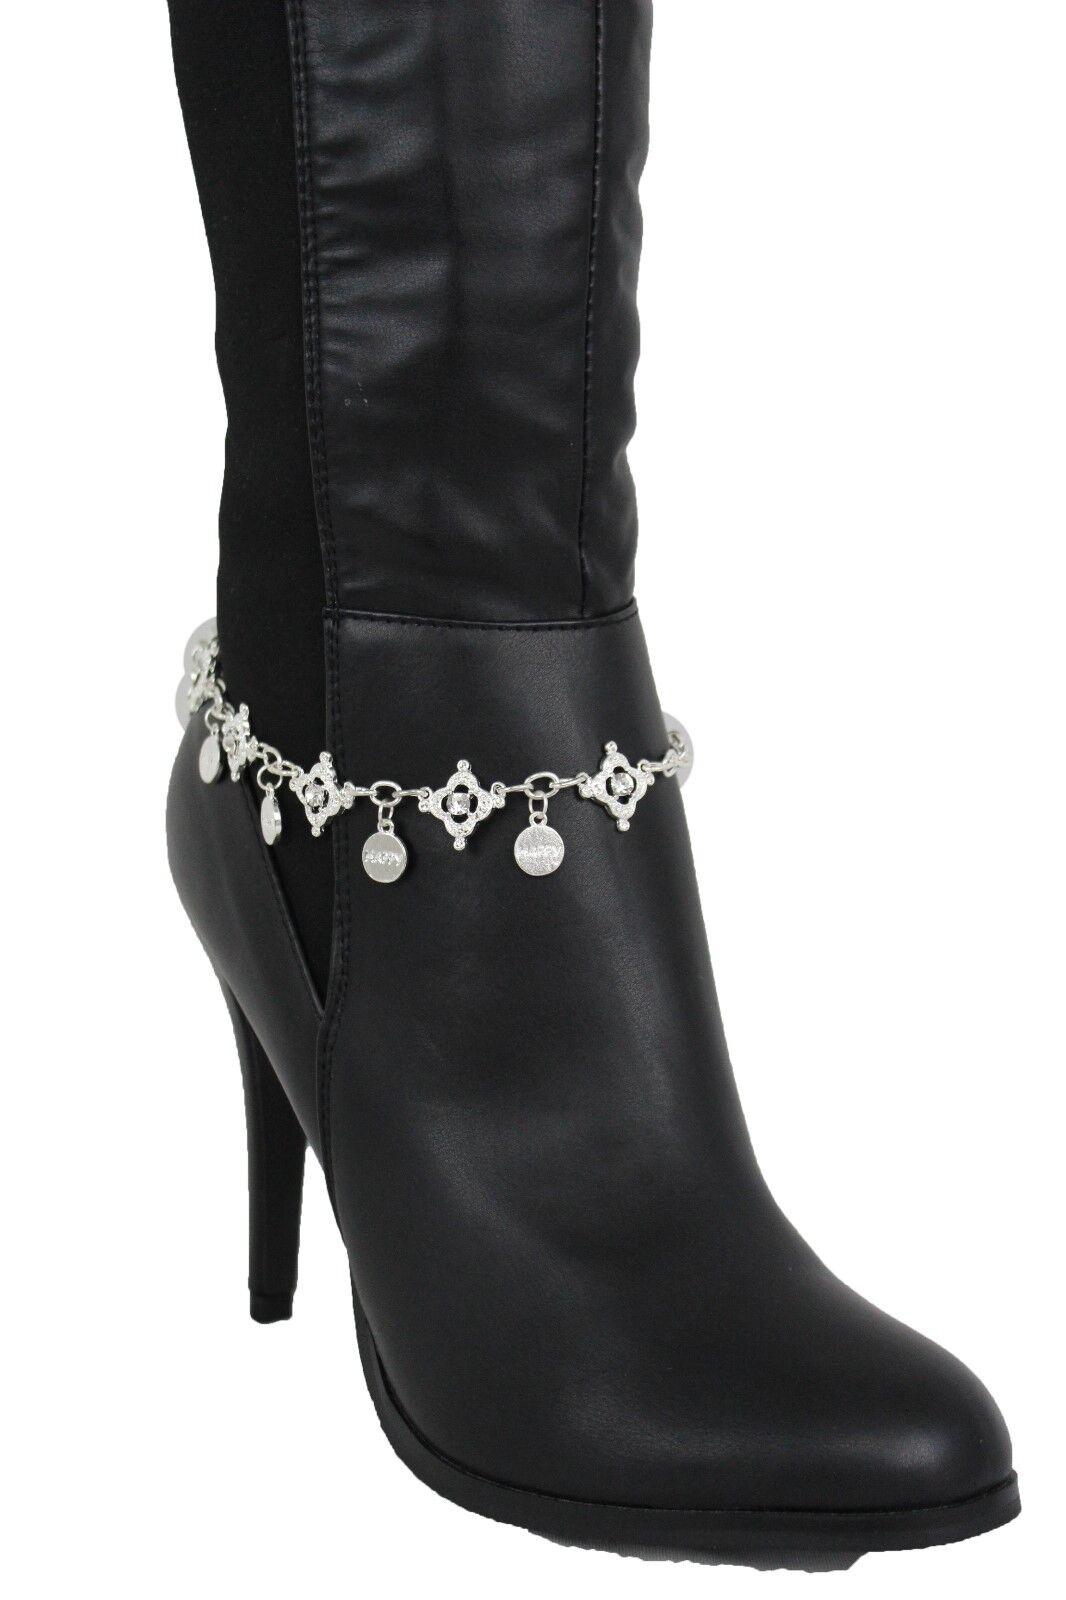 Fun Women Silver Boot Beacelet Chain Bling Fashion Shoe Charm Happy Bling Phrase